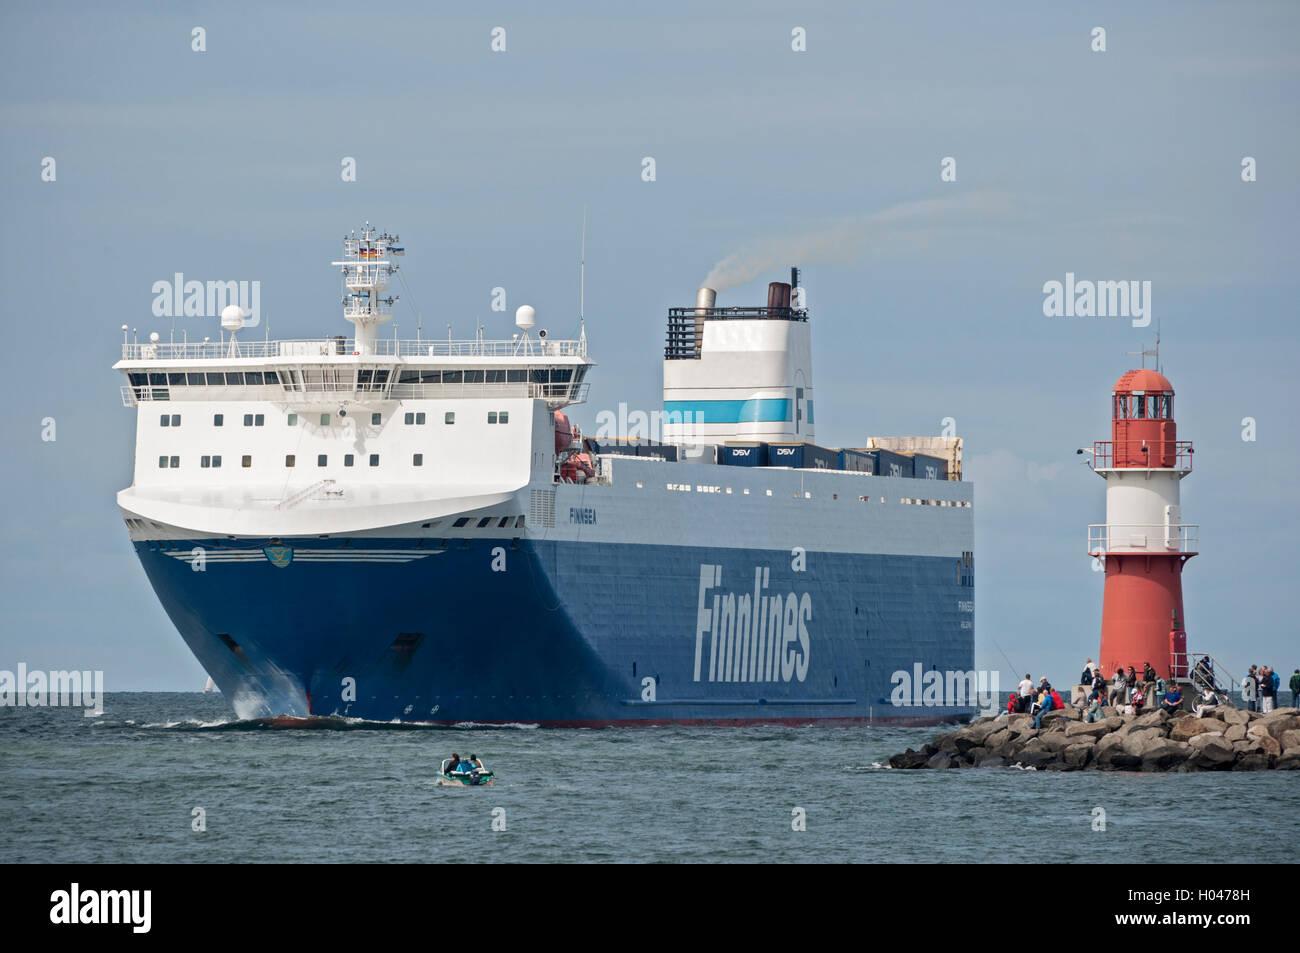 Finnlines ferry entering Rostock - Warnemünde on the Baltic Sea, Germany. - Stock Image